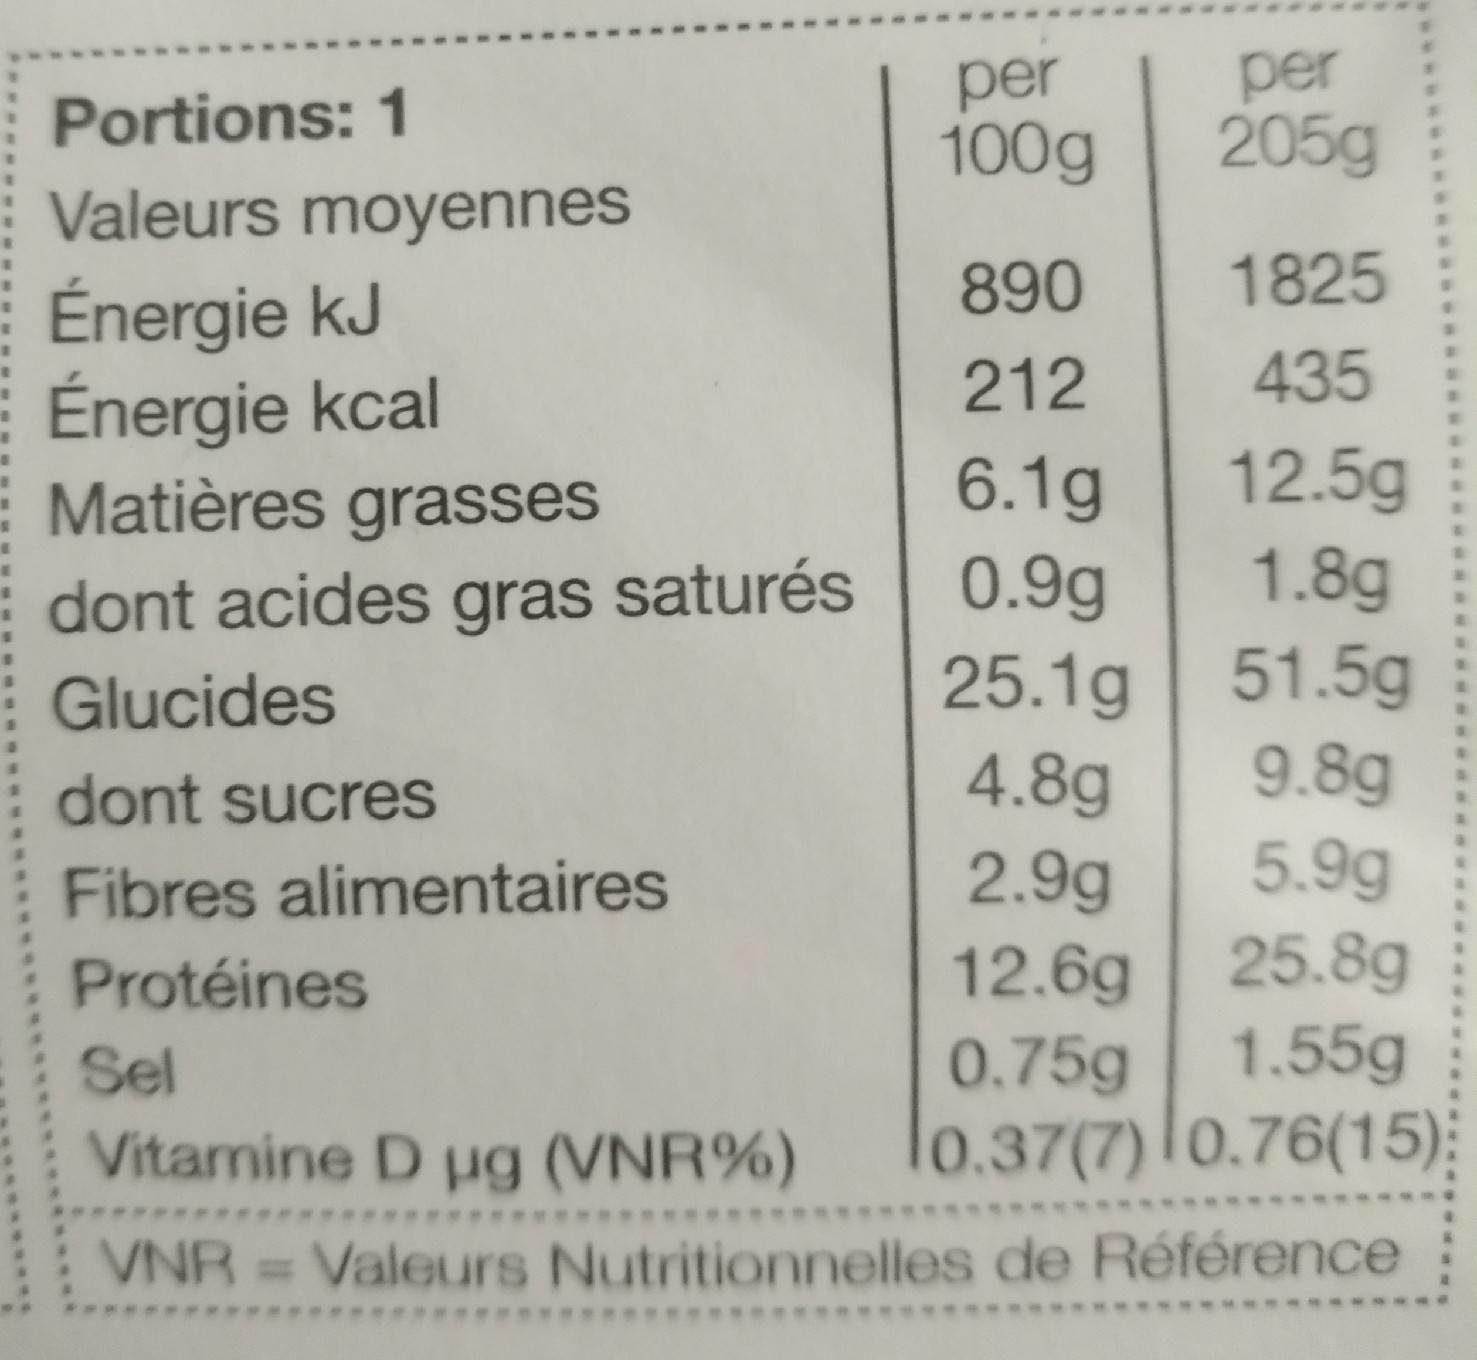 Boeuf rôti et oignon - Nutrition facts